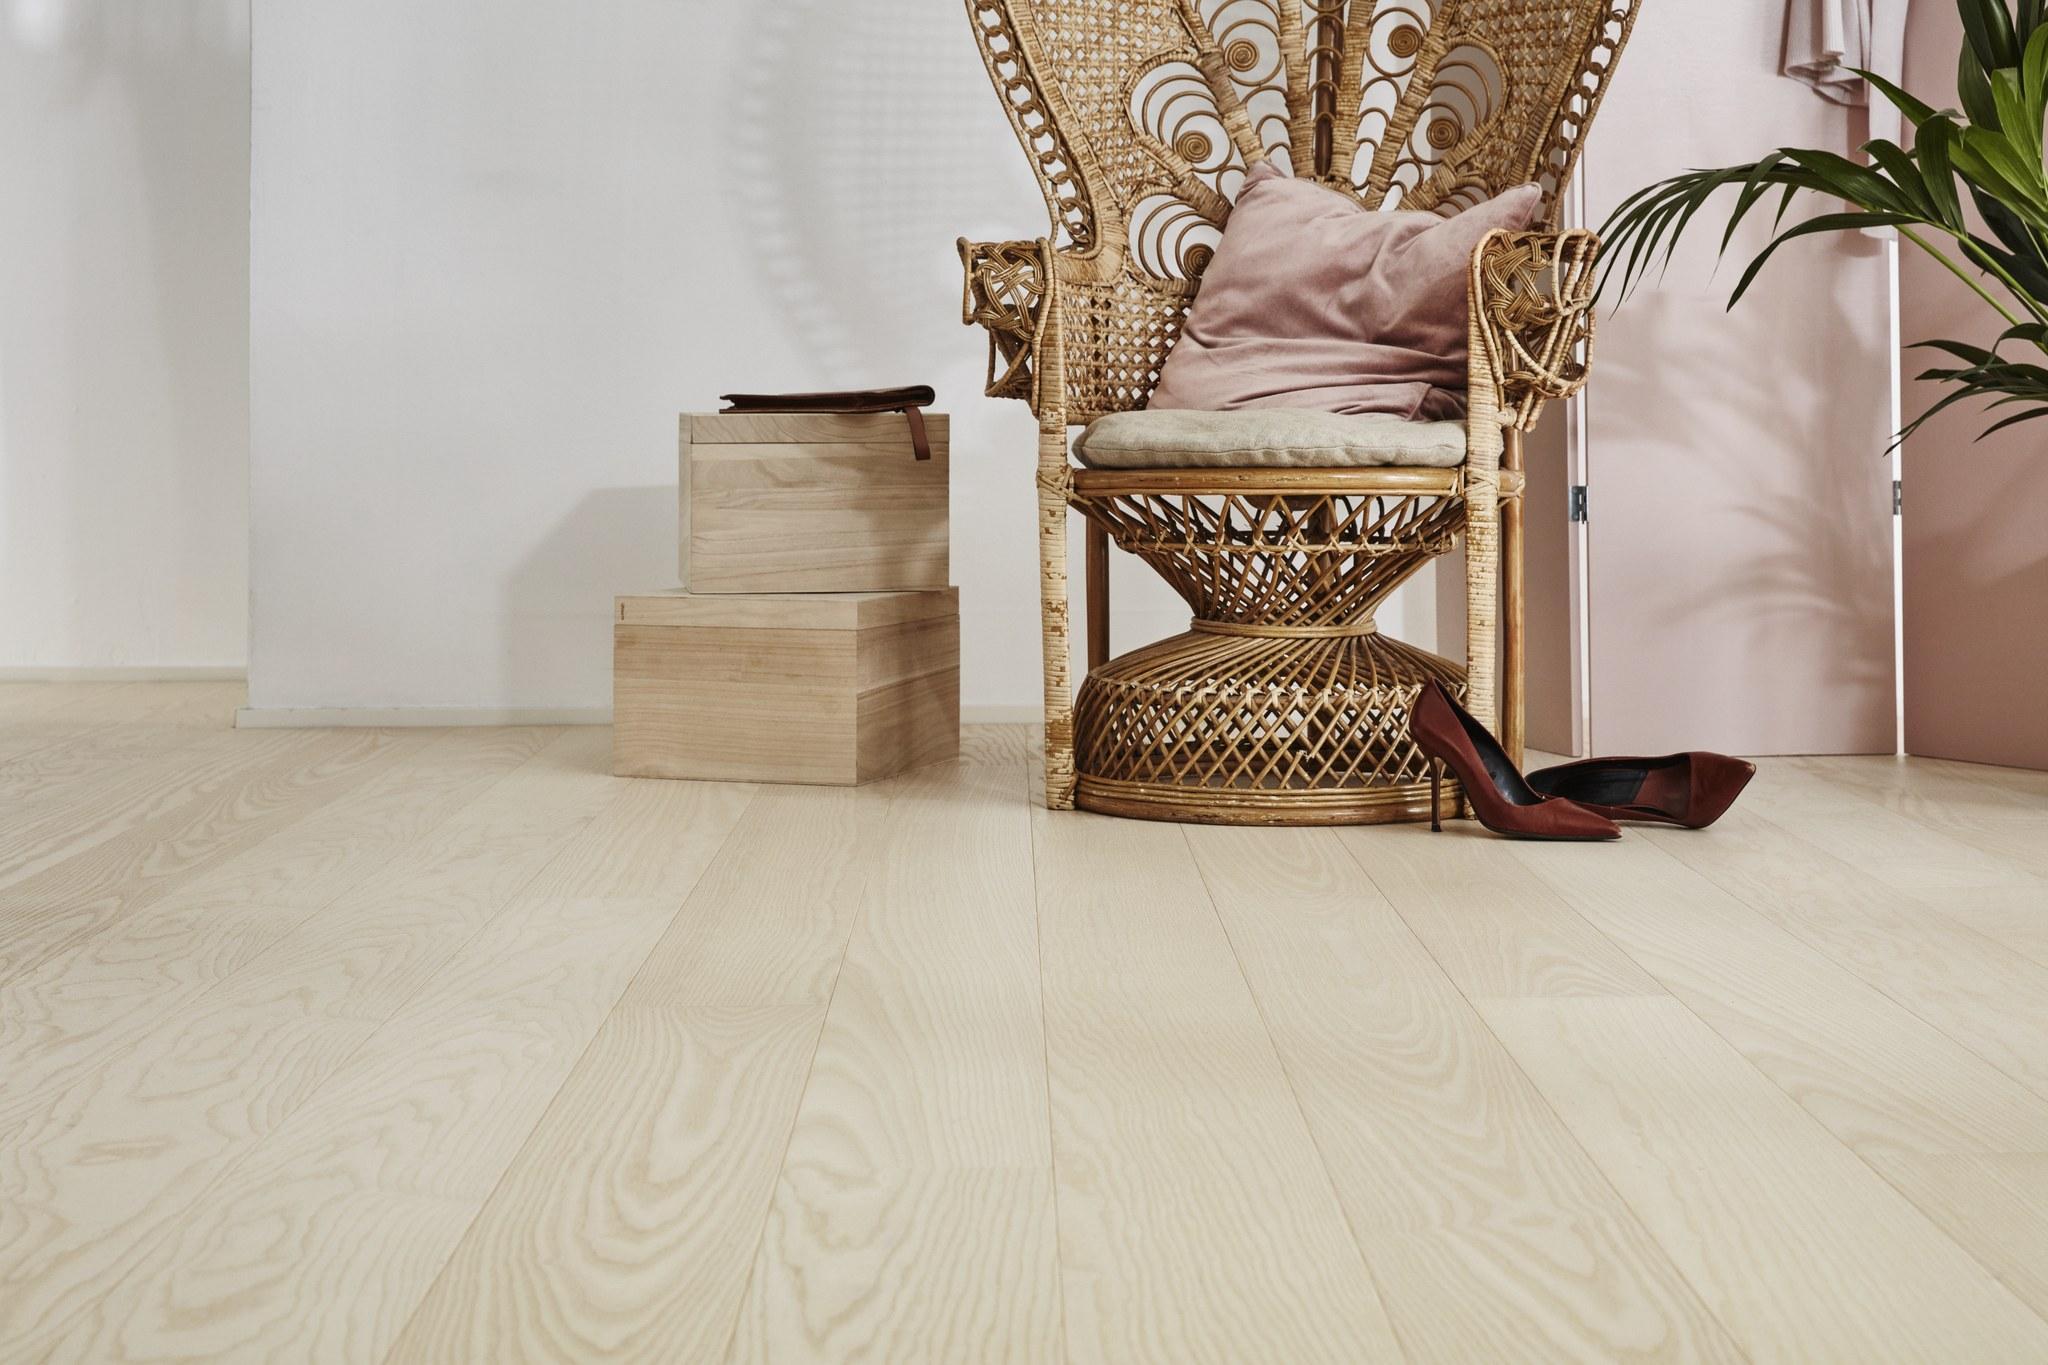 Timberwise Saarni Select Hiottu Sand Valkooljyvahattu Whitewaxoil Pysty